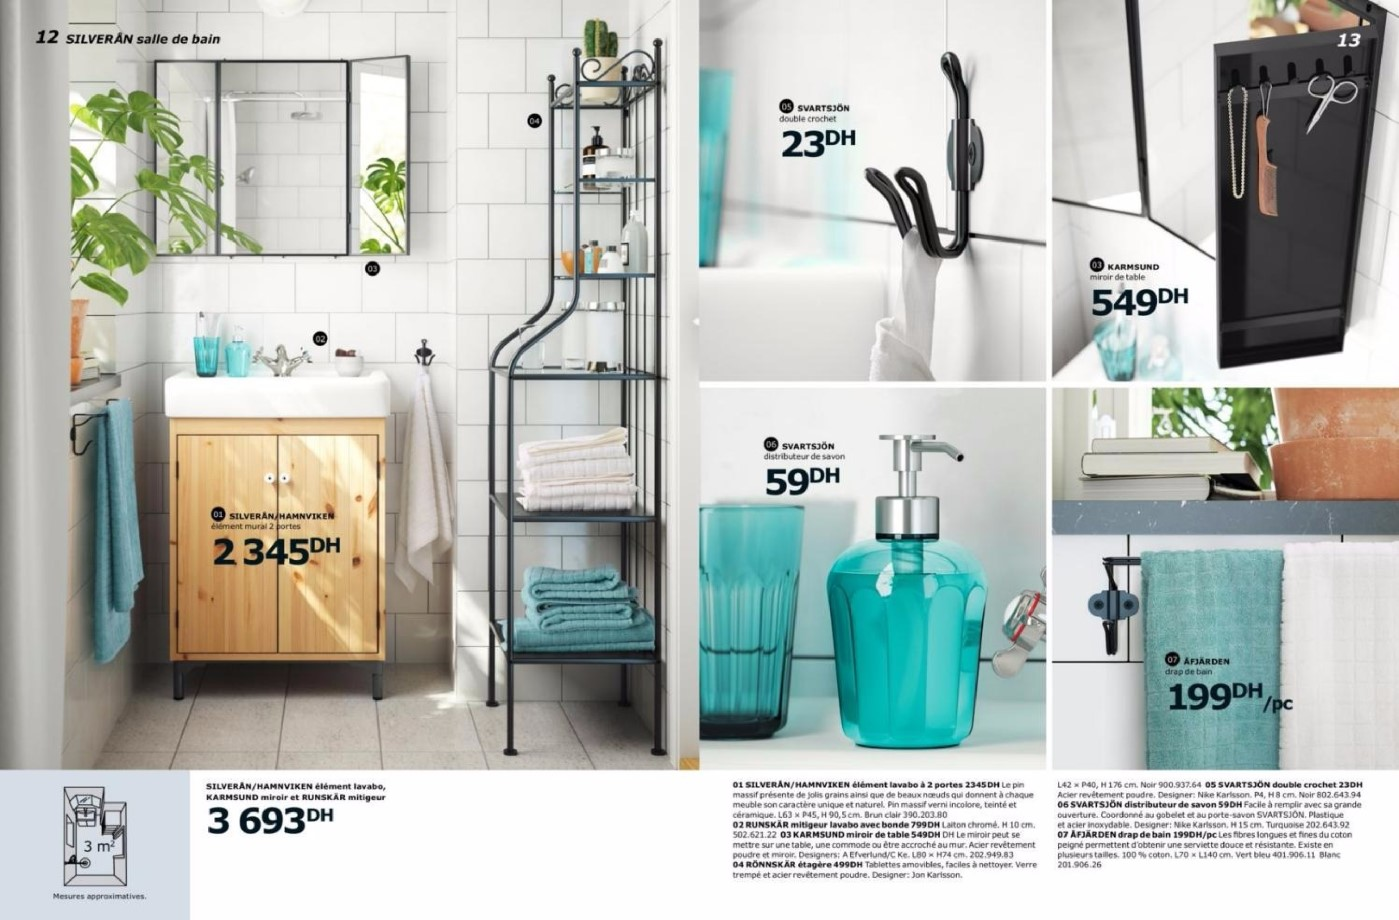 catalogue ikea maroc salles de bain 2017 solde et promotion du maroc. Black Bedroom Furniture Sets. Home Design Ideas